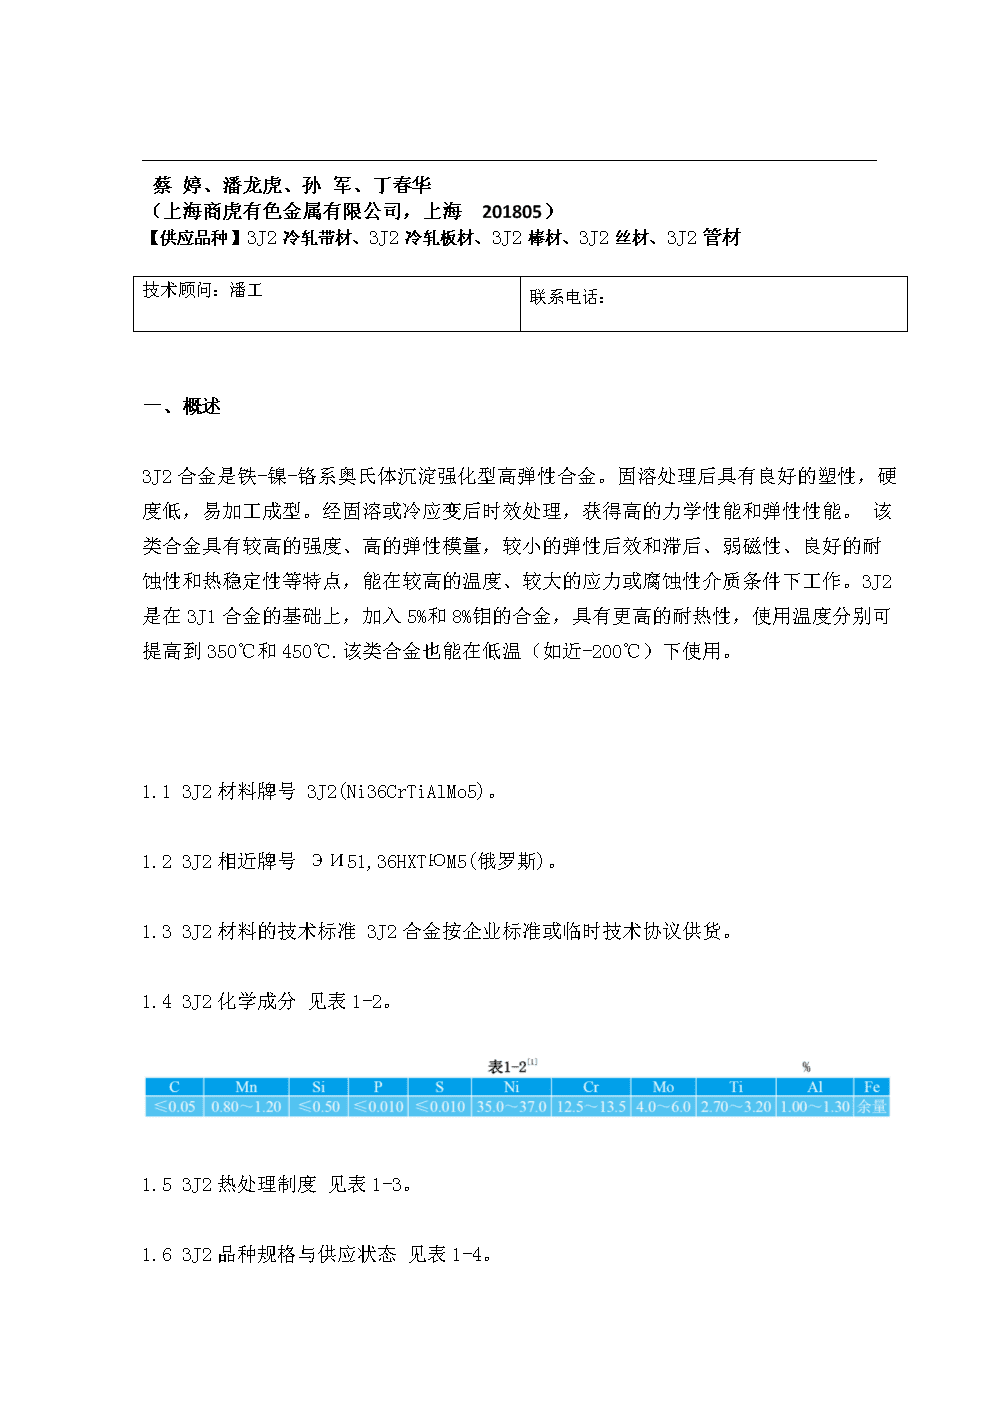 3J2(Ni36CrTiAlMo5)合金-上海商虎合金技术.doc